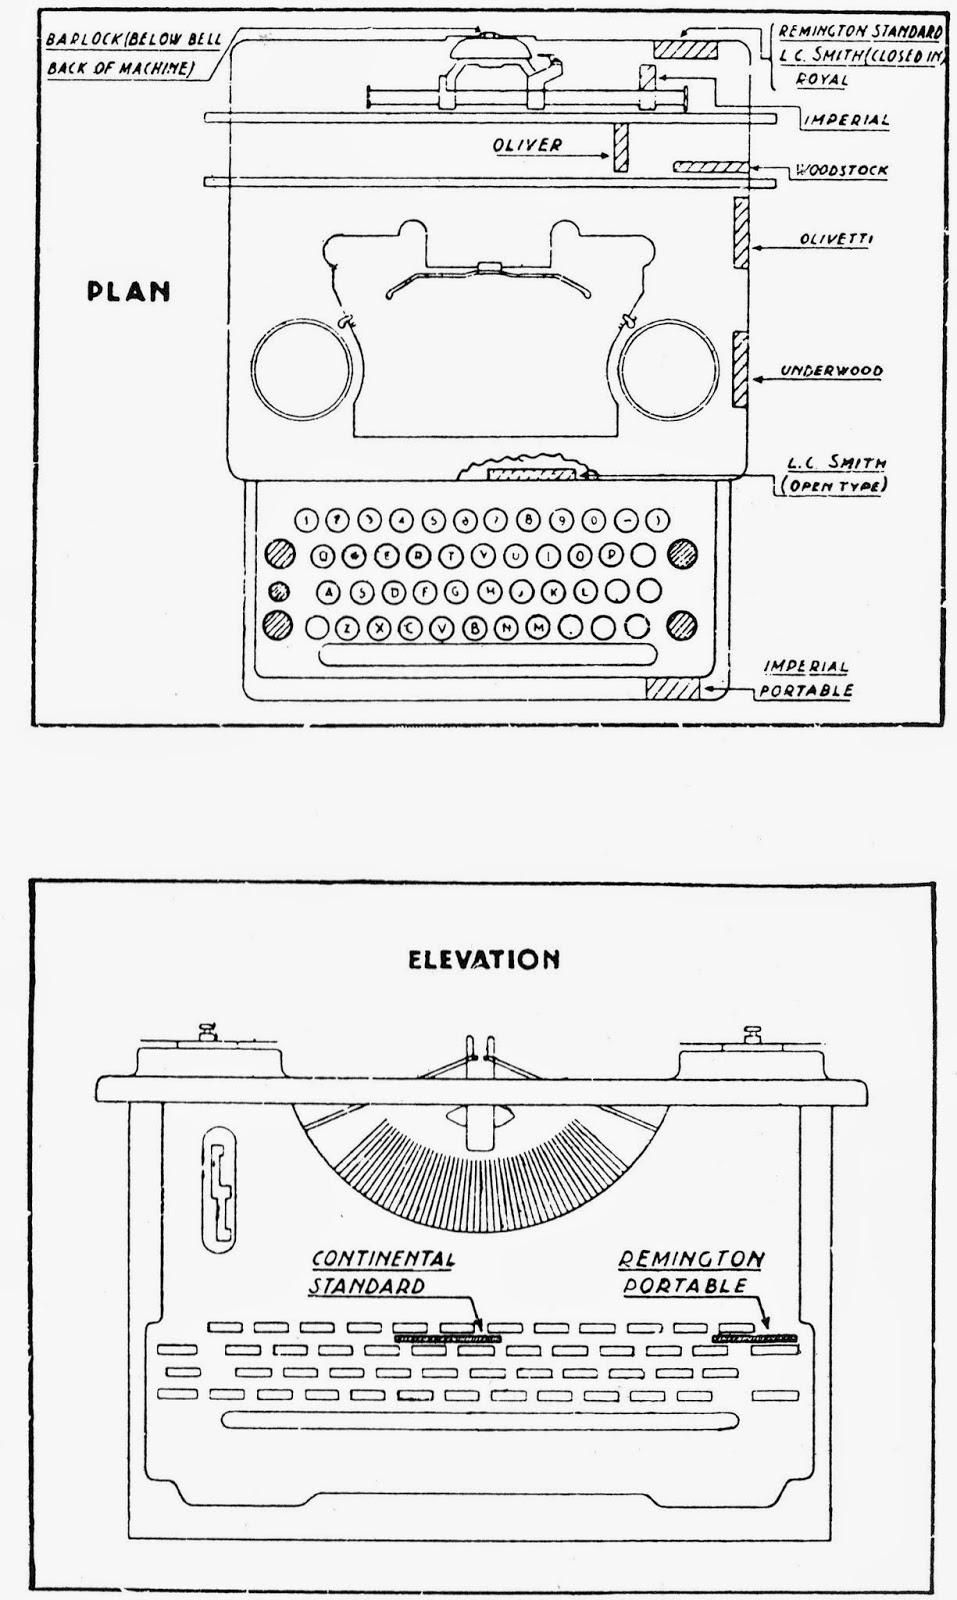 Serial number lookup typewriter Untitled Document